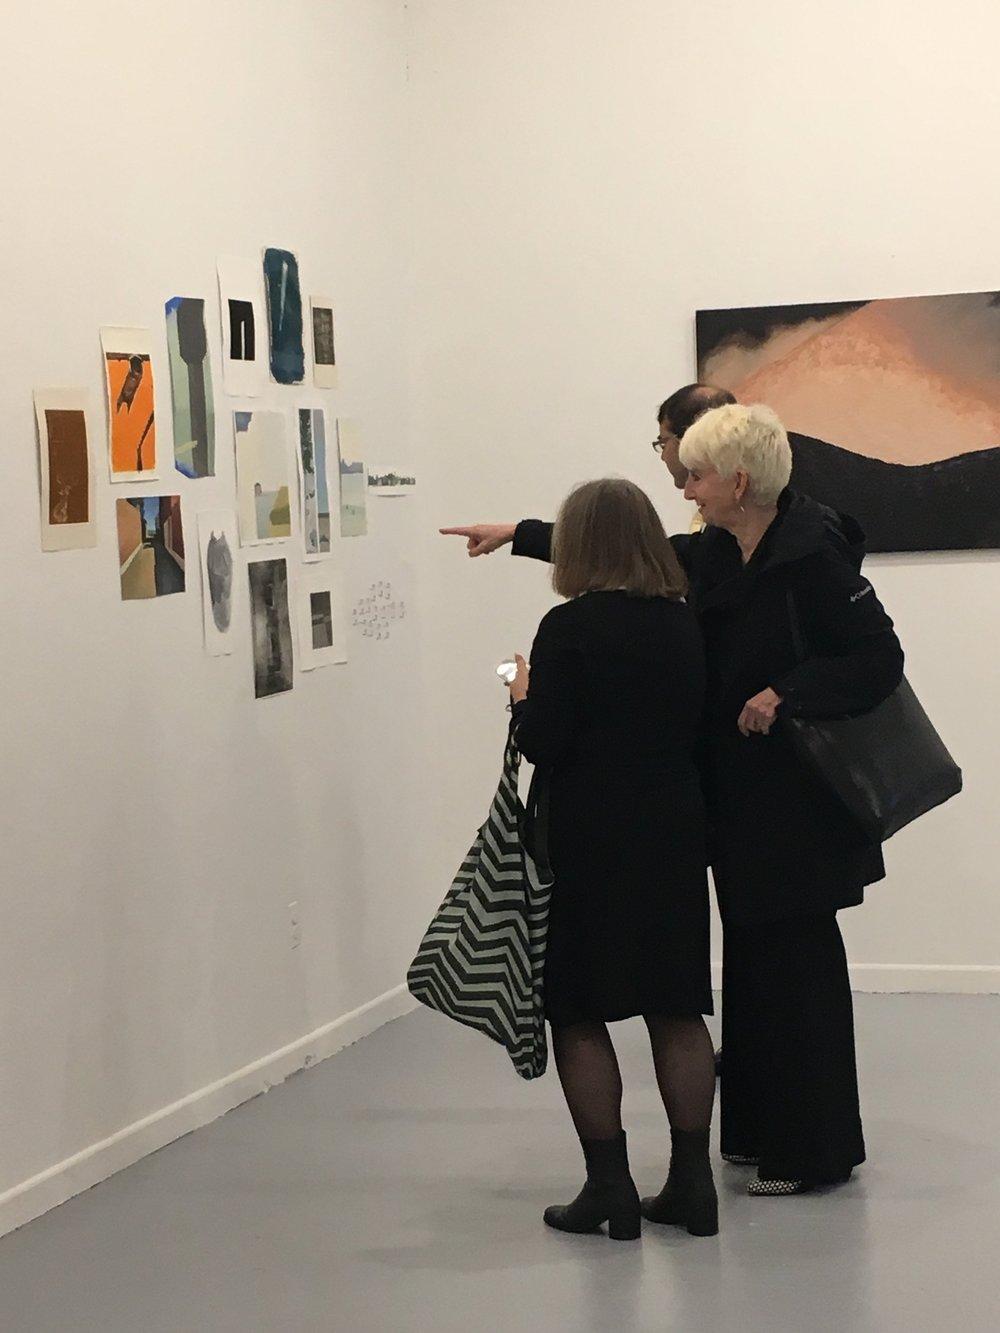 President Frances Bronet, husband Jeff Paules, and Pratt in Venice Director Diana Gisolfi admiring MFA student Xingze Li's work